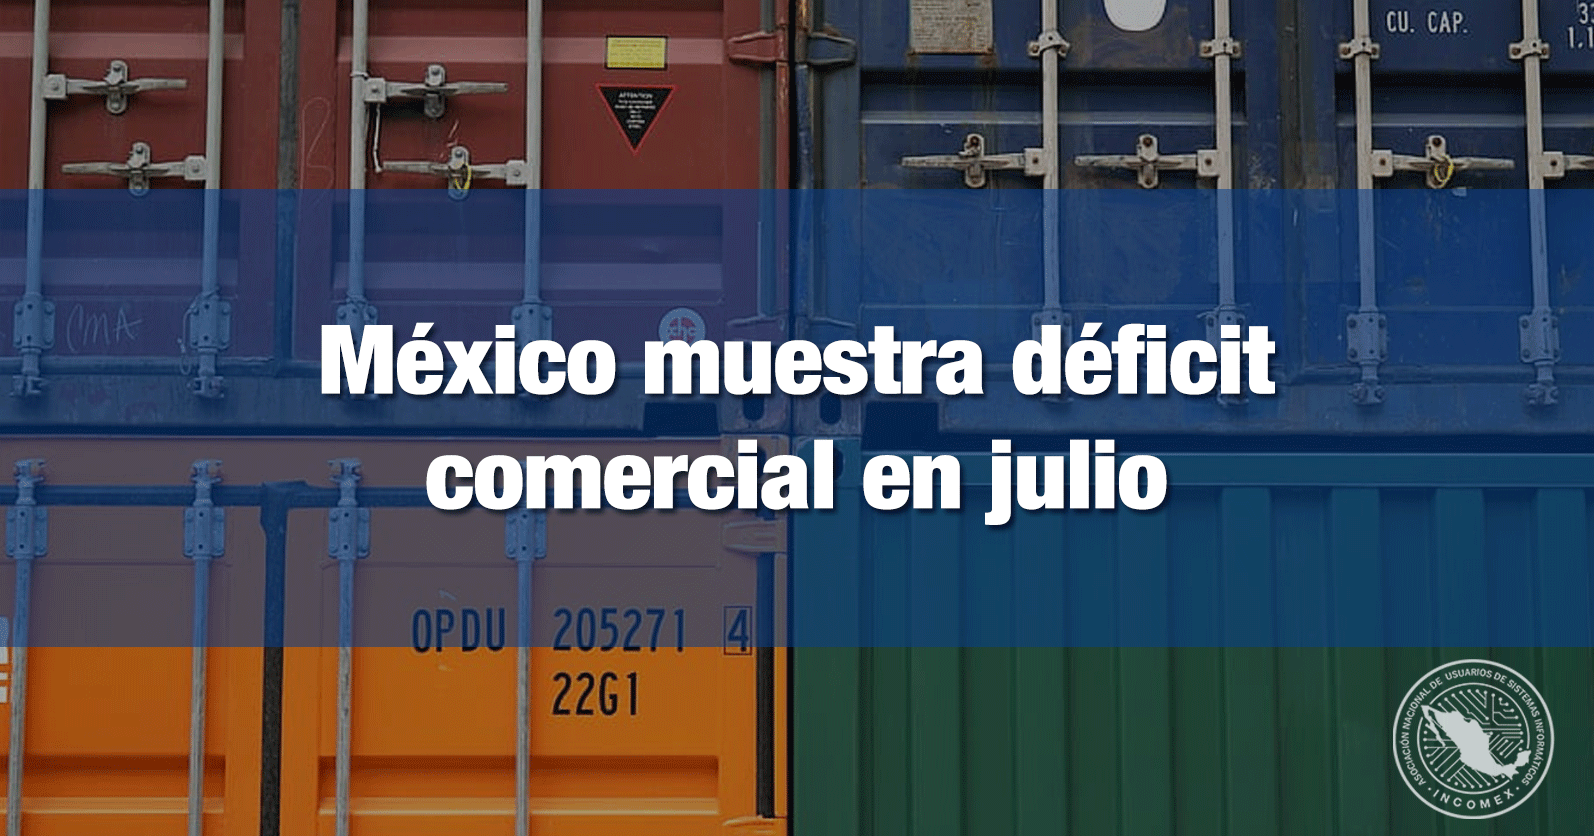 México muestra déficit comercial en julio